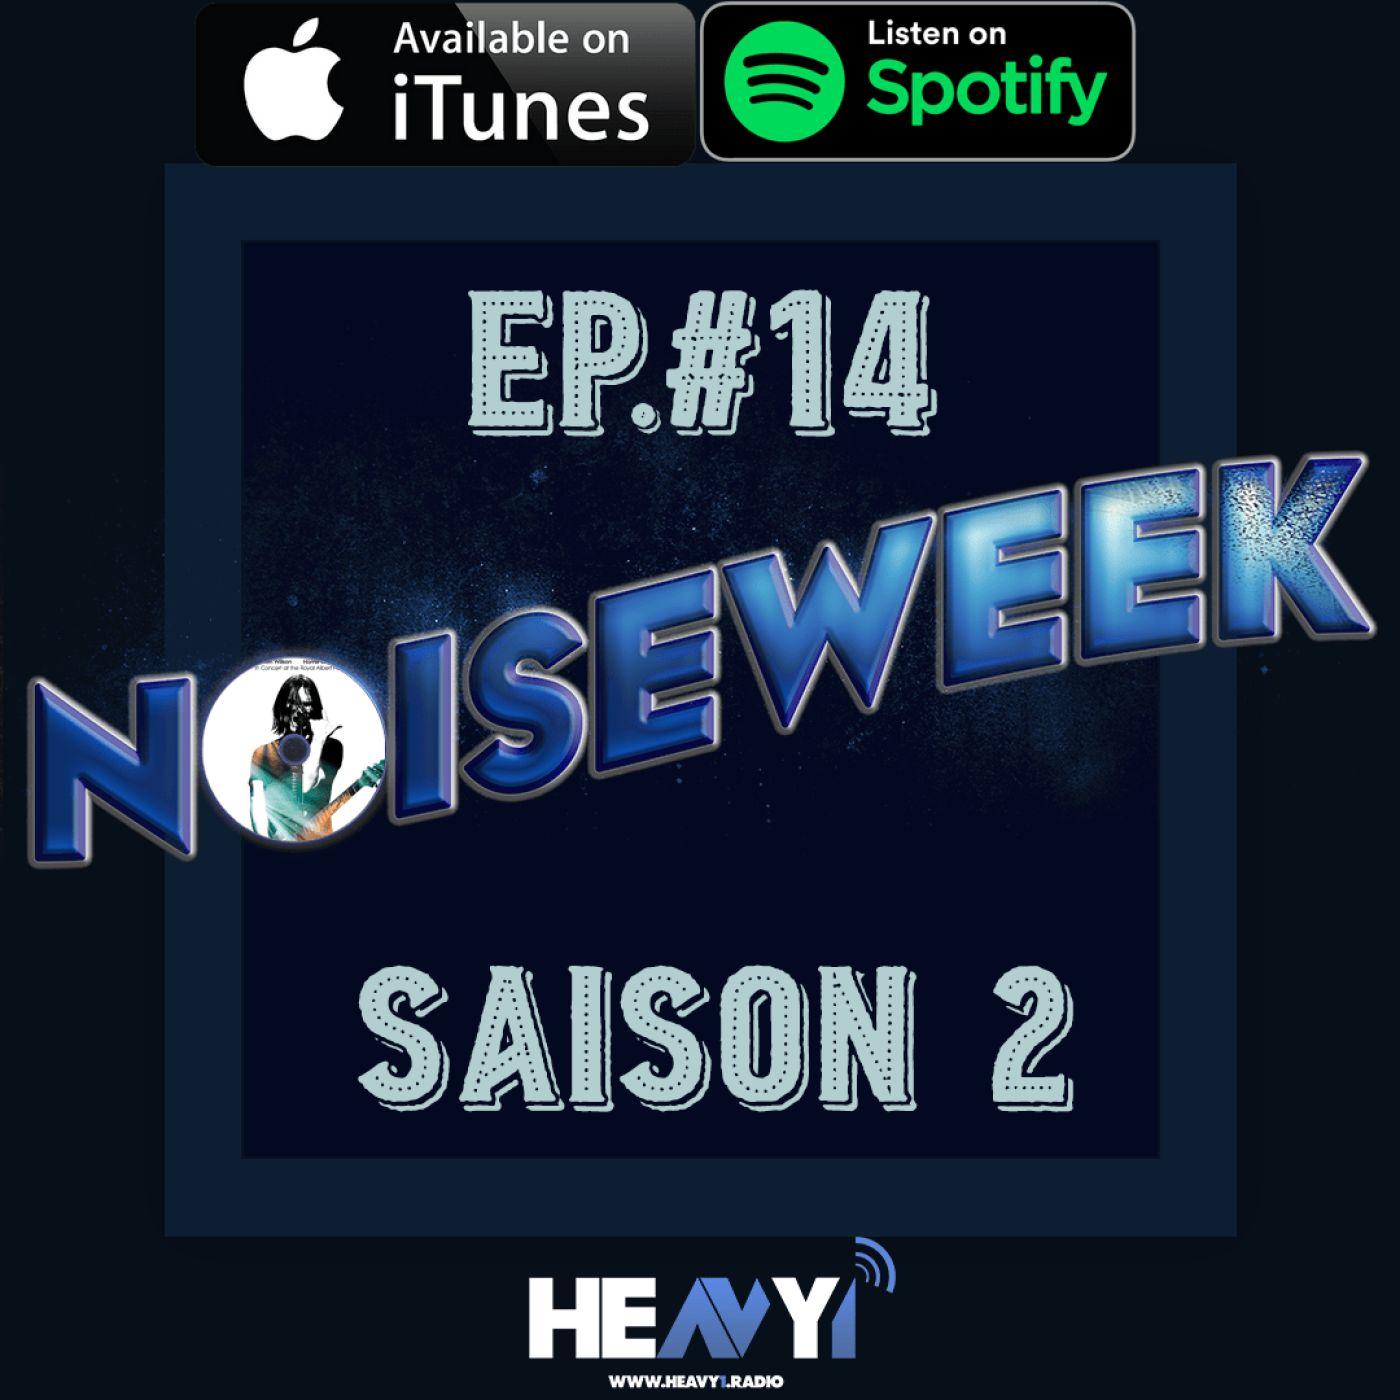 Noiseweek #14 Saison 2